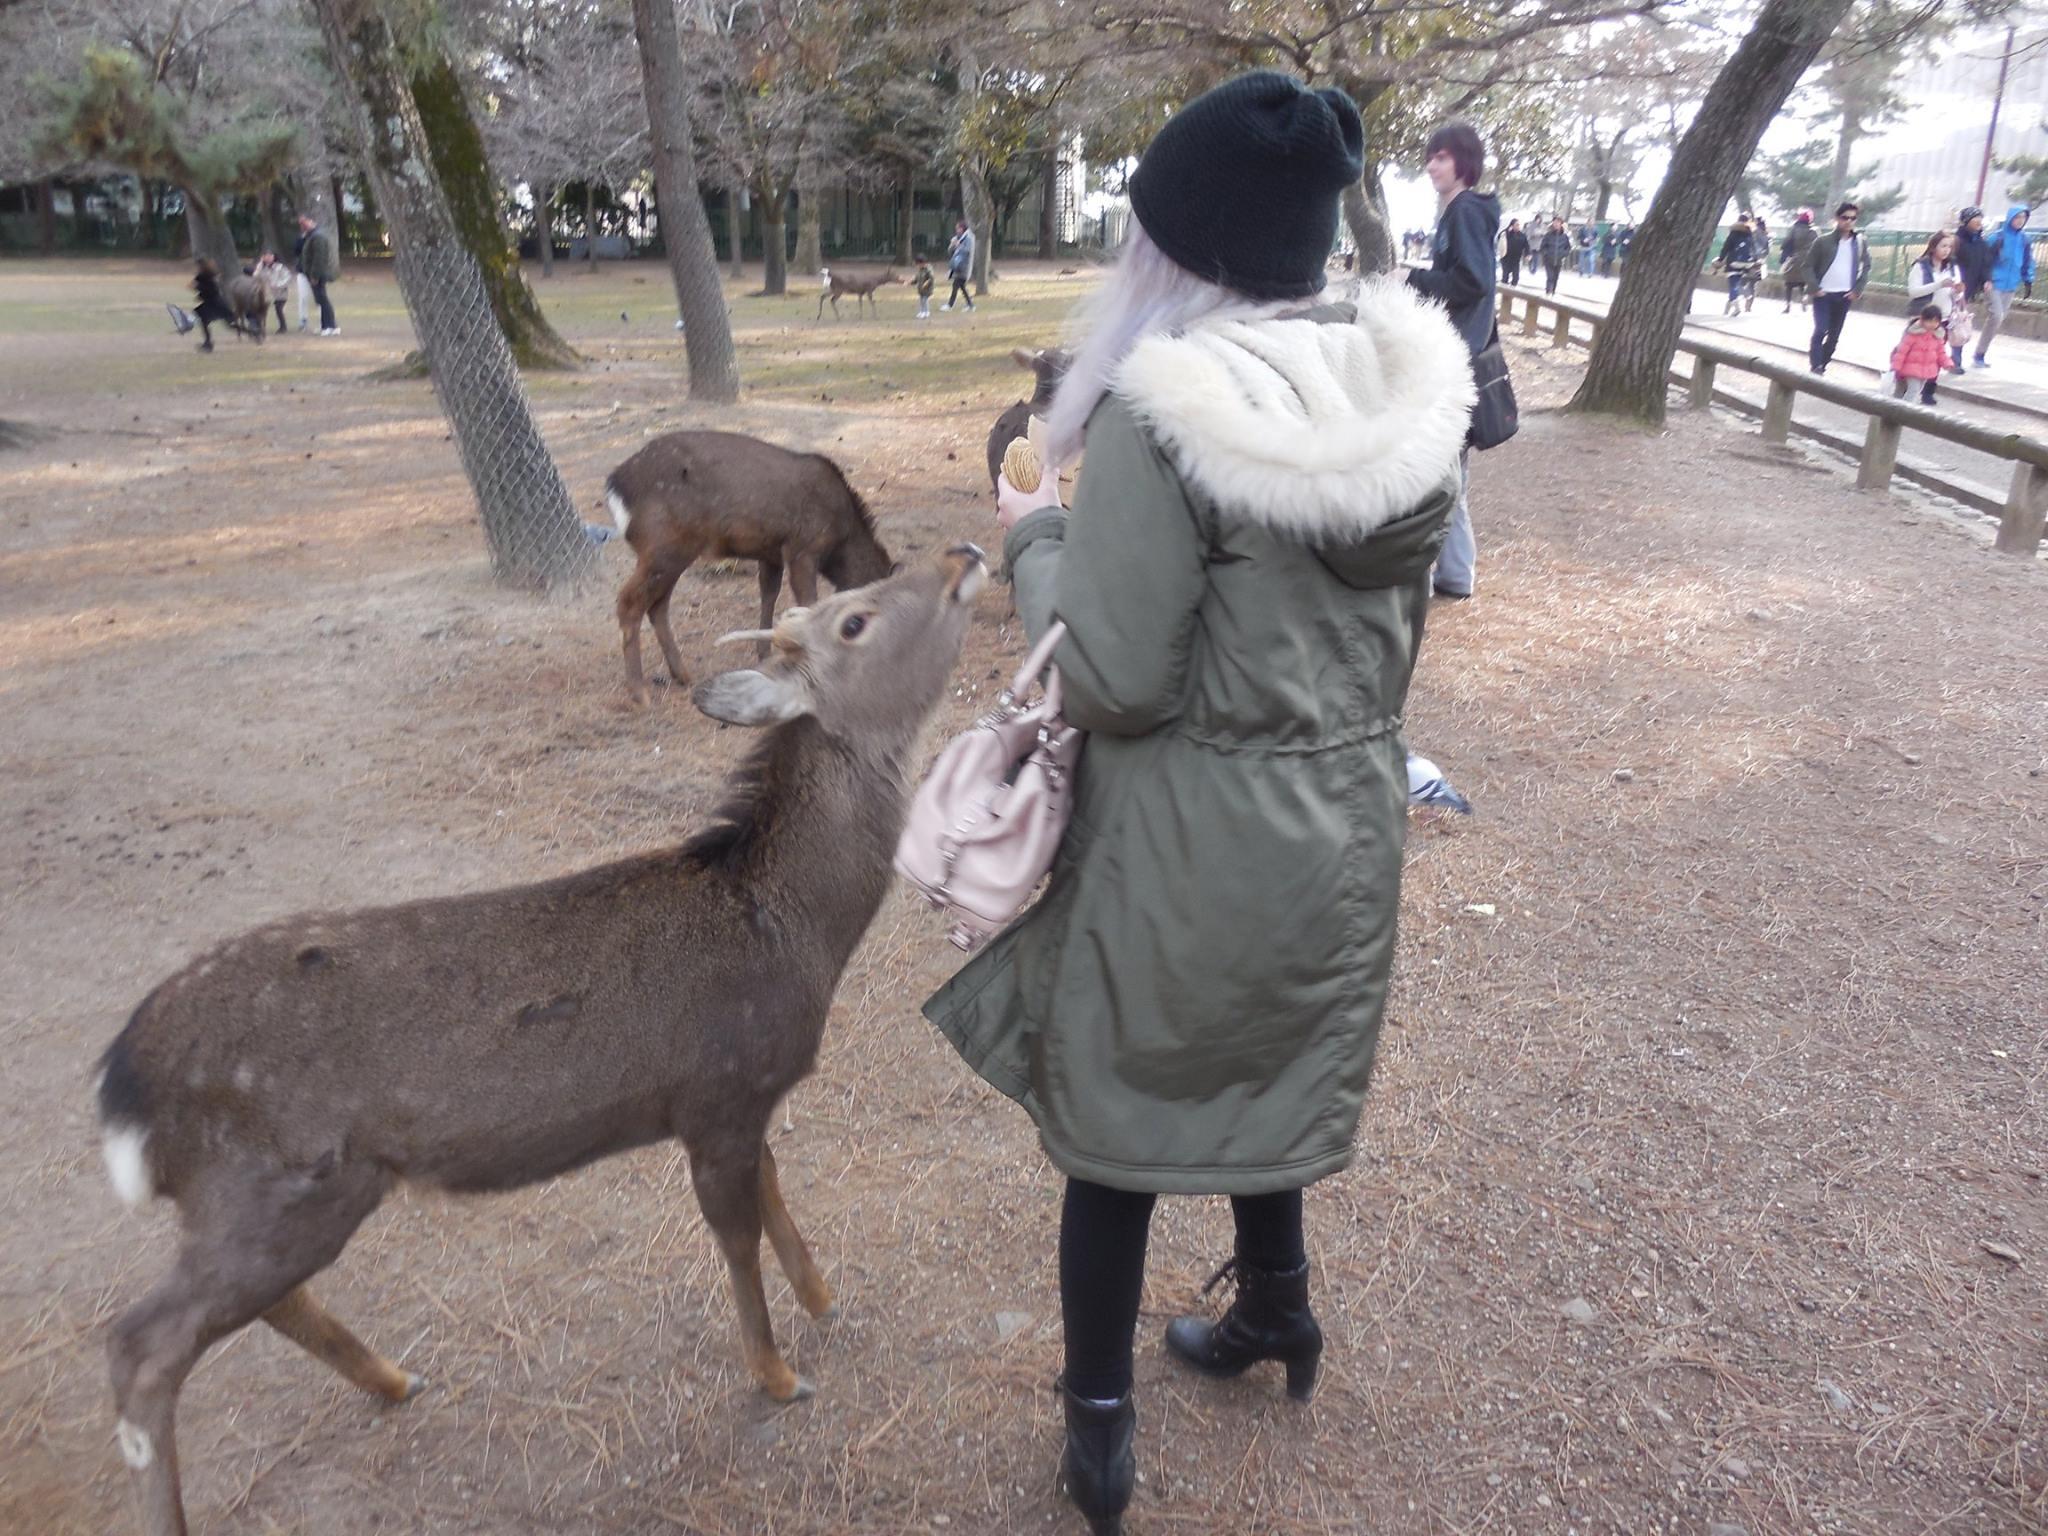 Nara was awesome